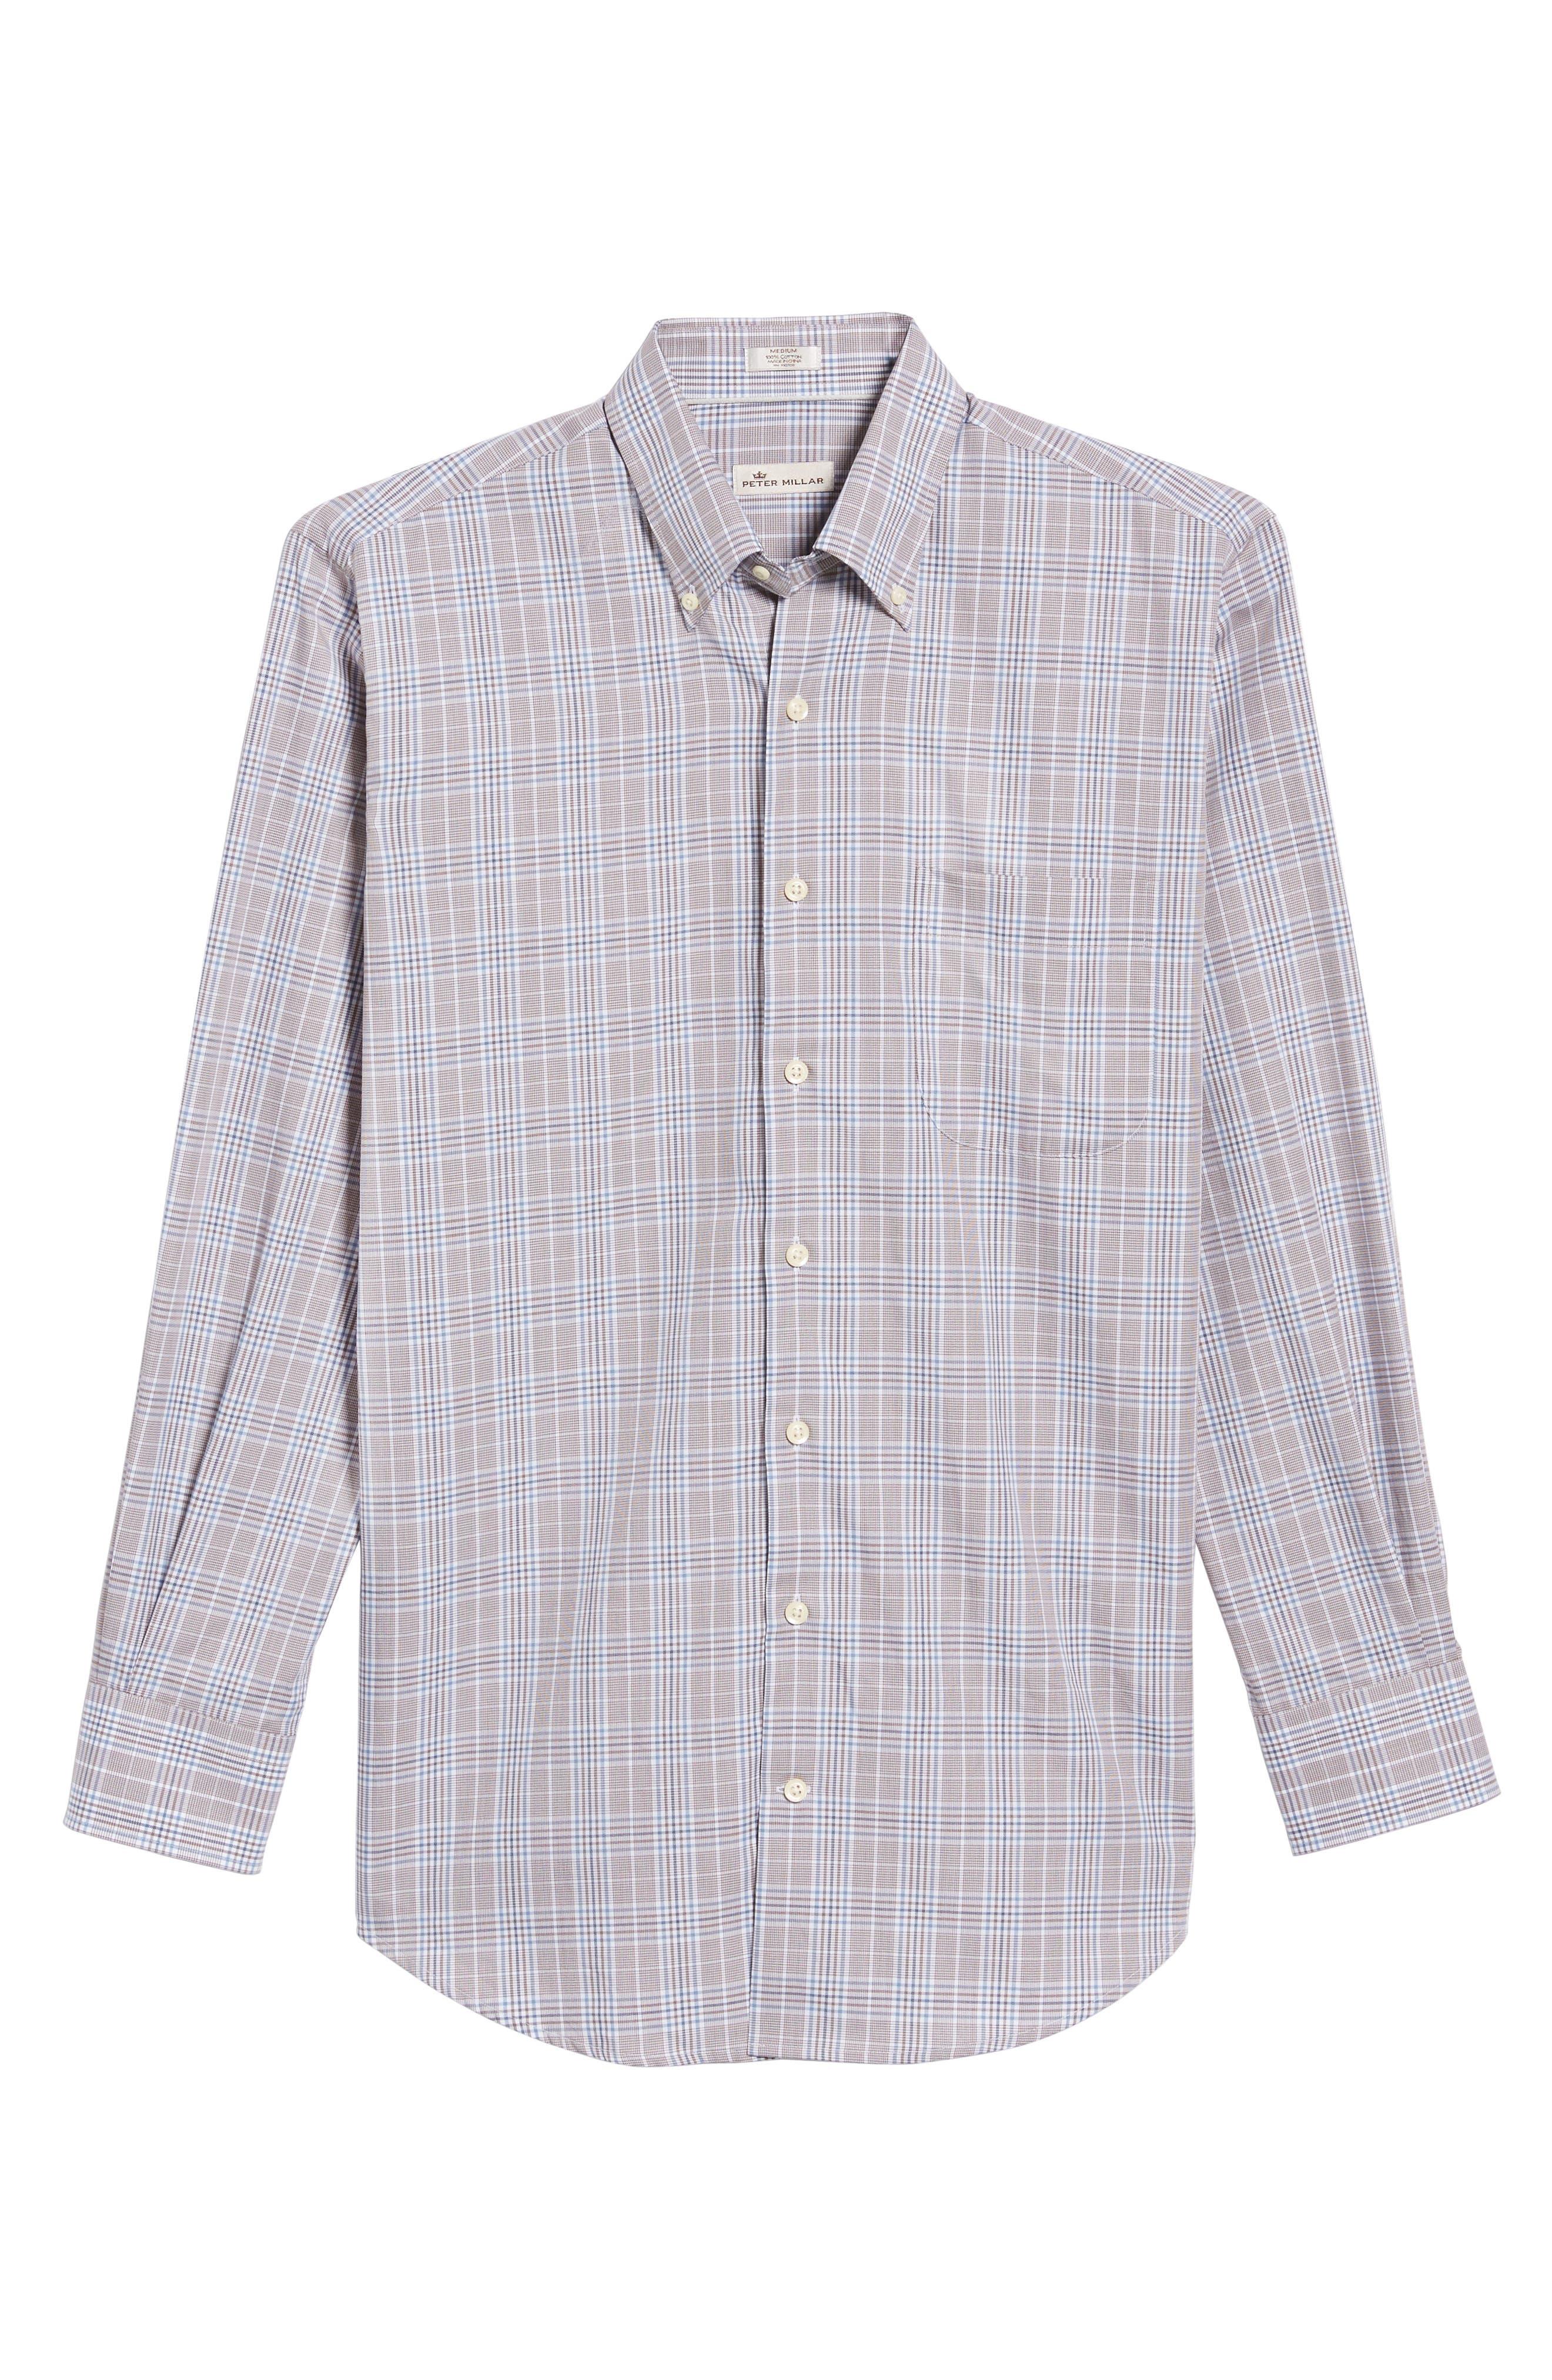 River Glen Plaid Regular Fit Sport Shirt,                             Alternate thumbnail 6, color,                             230